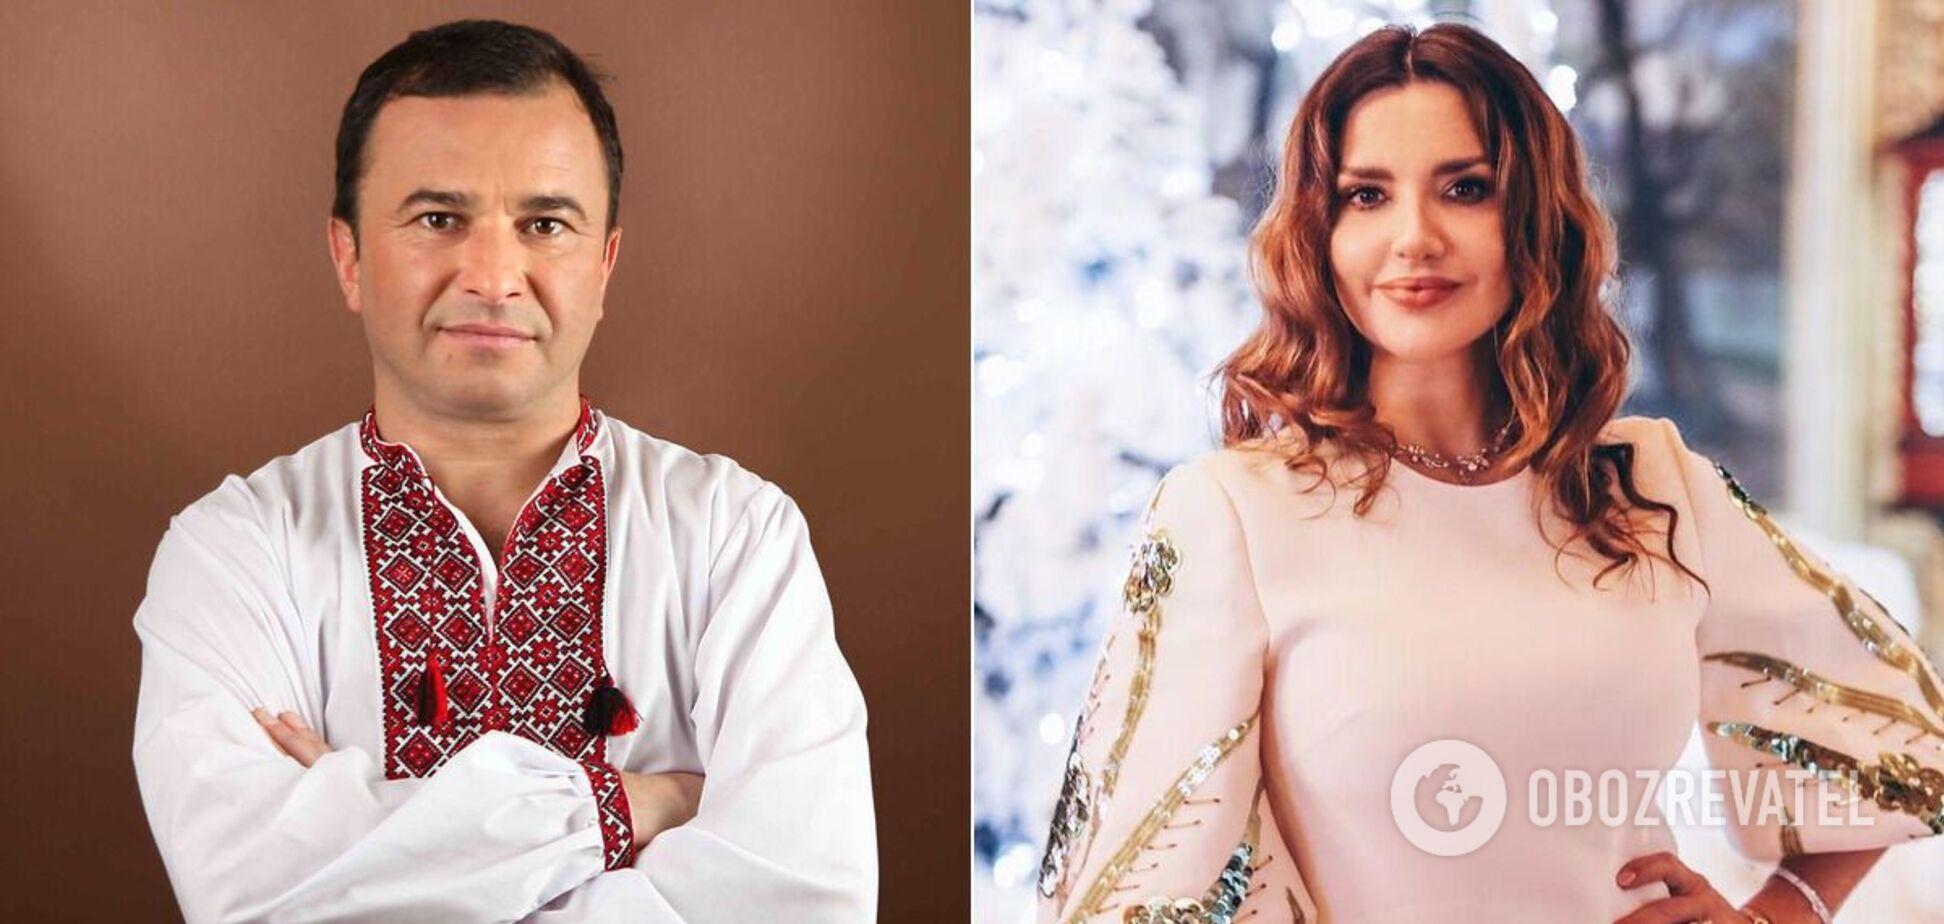 Виктор Павлик и Оксана Марченко